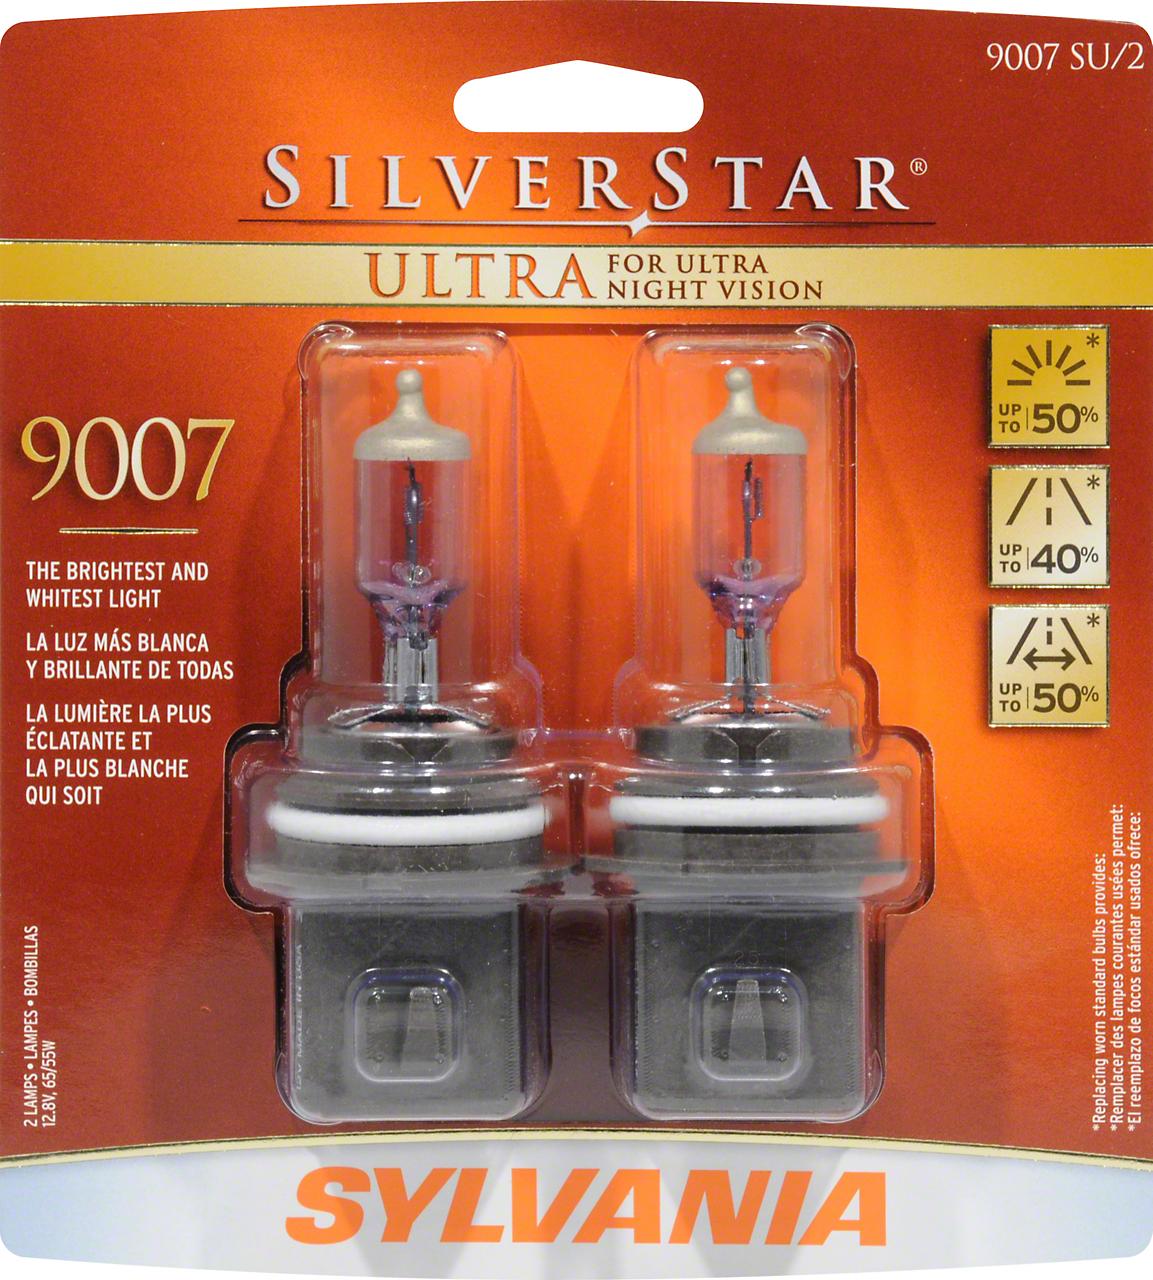 Sylvania Silverstar Ultra Light Bulbs - 9007